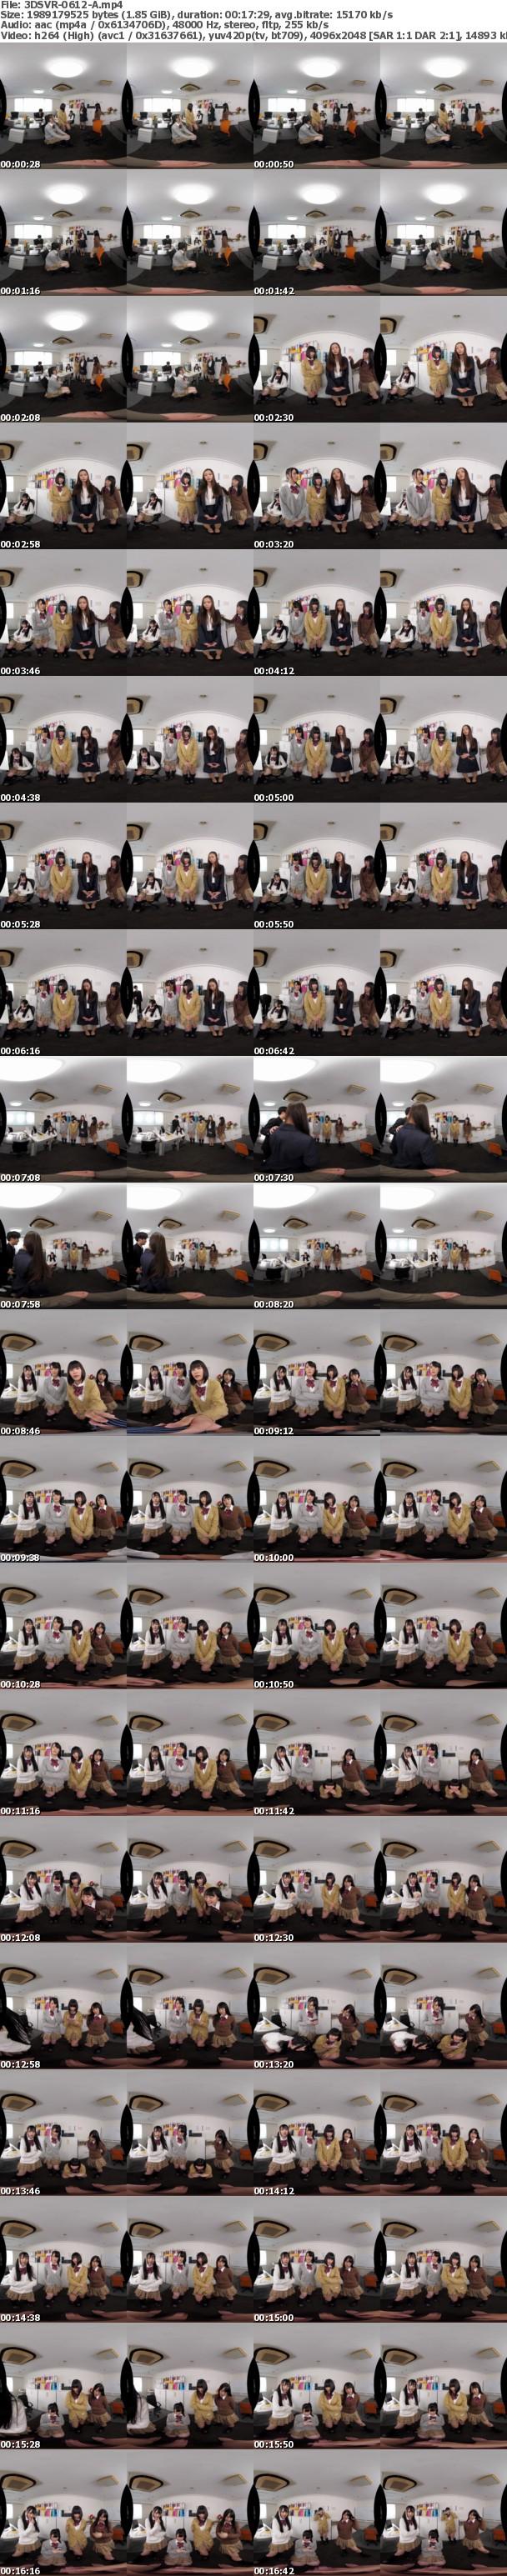 (VR) 3DSVR-0612 【超ドM専用:集団逆レ×プVR】貞操逆転・立場逆転した女子校の担任になって、無理やり4人の生徒全員に強●ドS痴女SEXで徹底的にヤラれまくる。